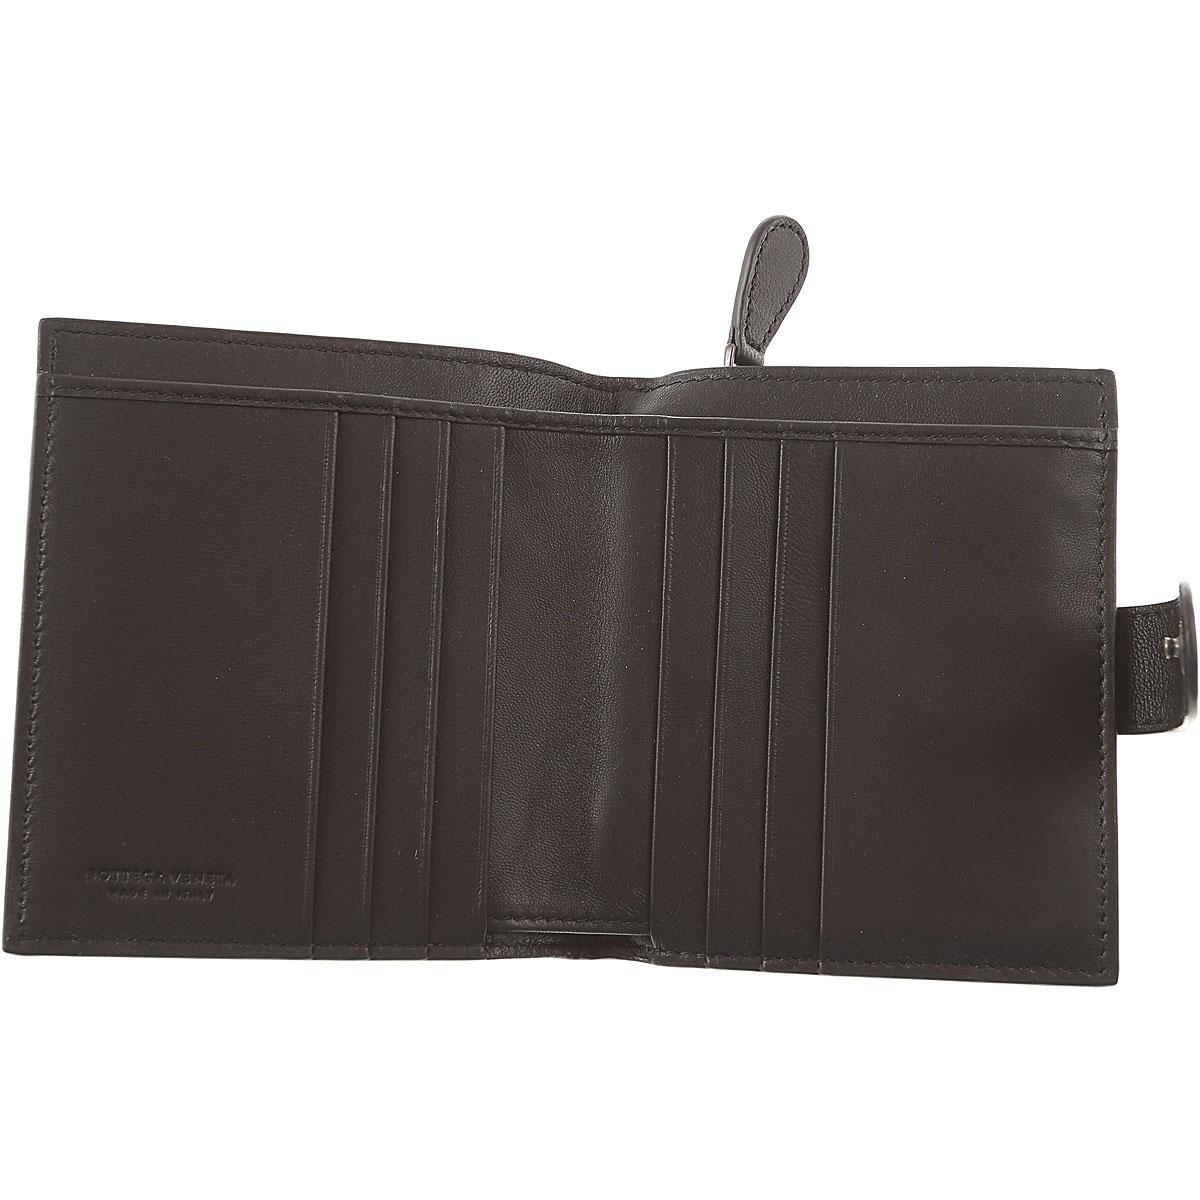 6bda2b6b02bd Bottega Veneta - Black Wallet For Women On Sale - Lyst. View fullscreen